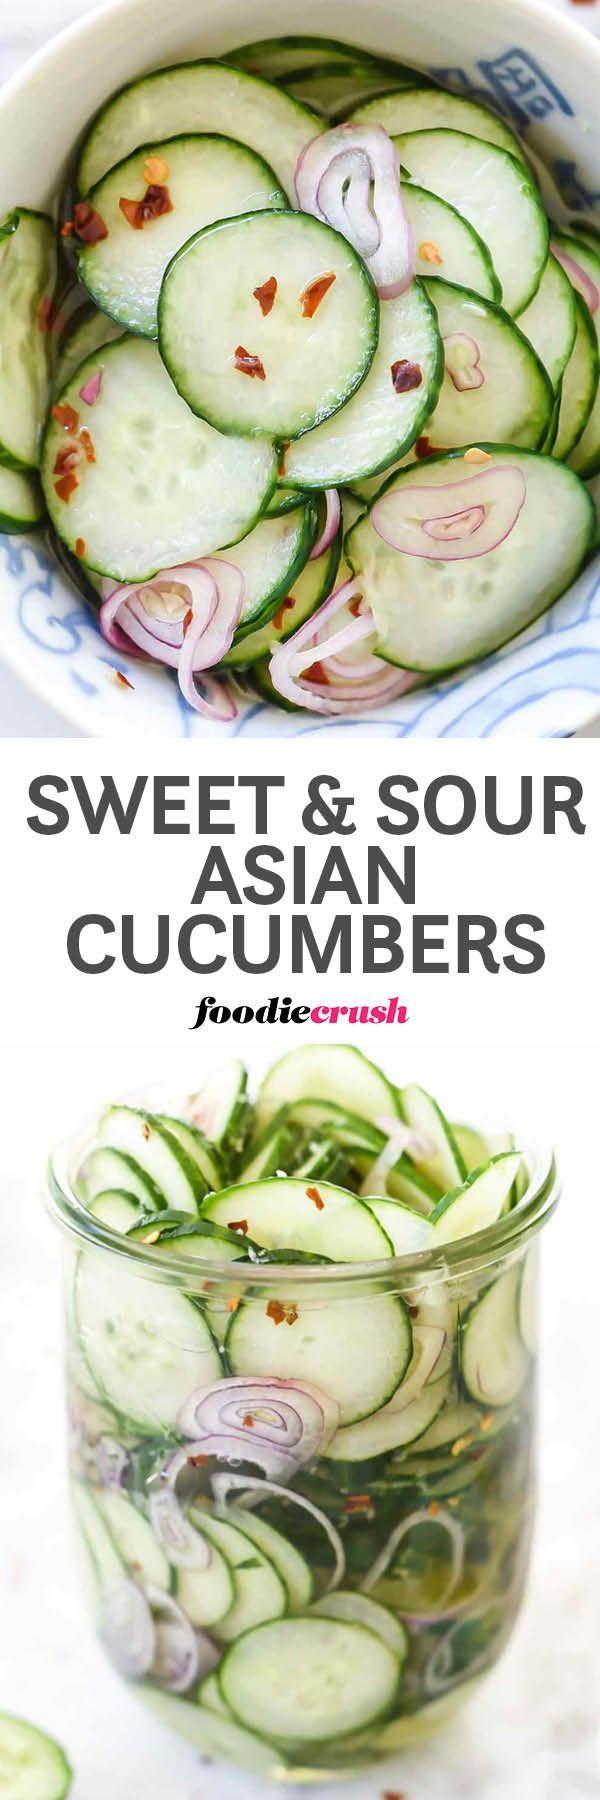 Healthy Thai Cucumber Salad Recipe foodiecrush.com | Asian Pickled Cucumbers Recipe | Rice Vinegar Pickled Cucumbers | Easy Pickled Cucumbers | Asian Pickles Recipe | Sweet and Sour Asian Pickles Cucumbers foodiecrush.com